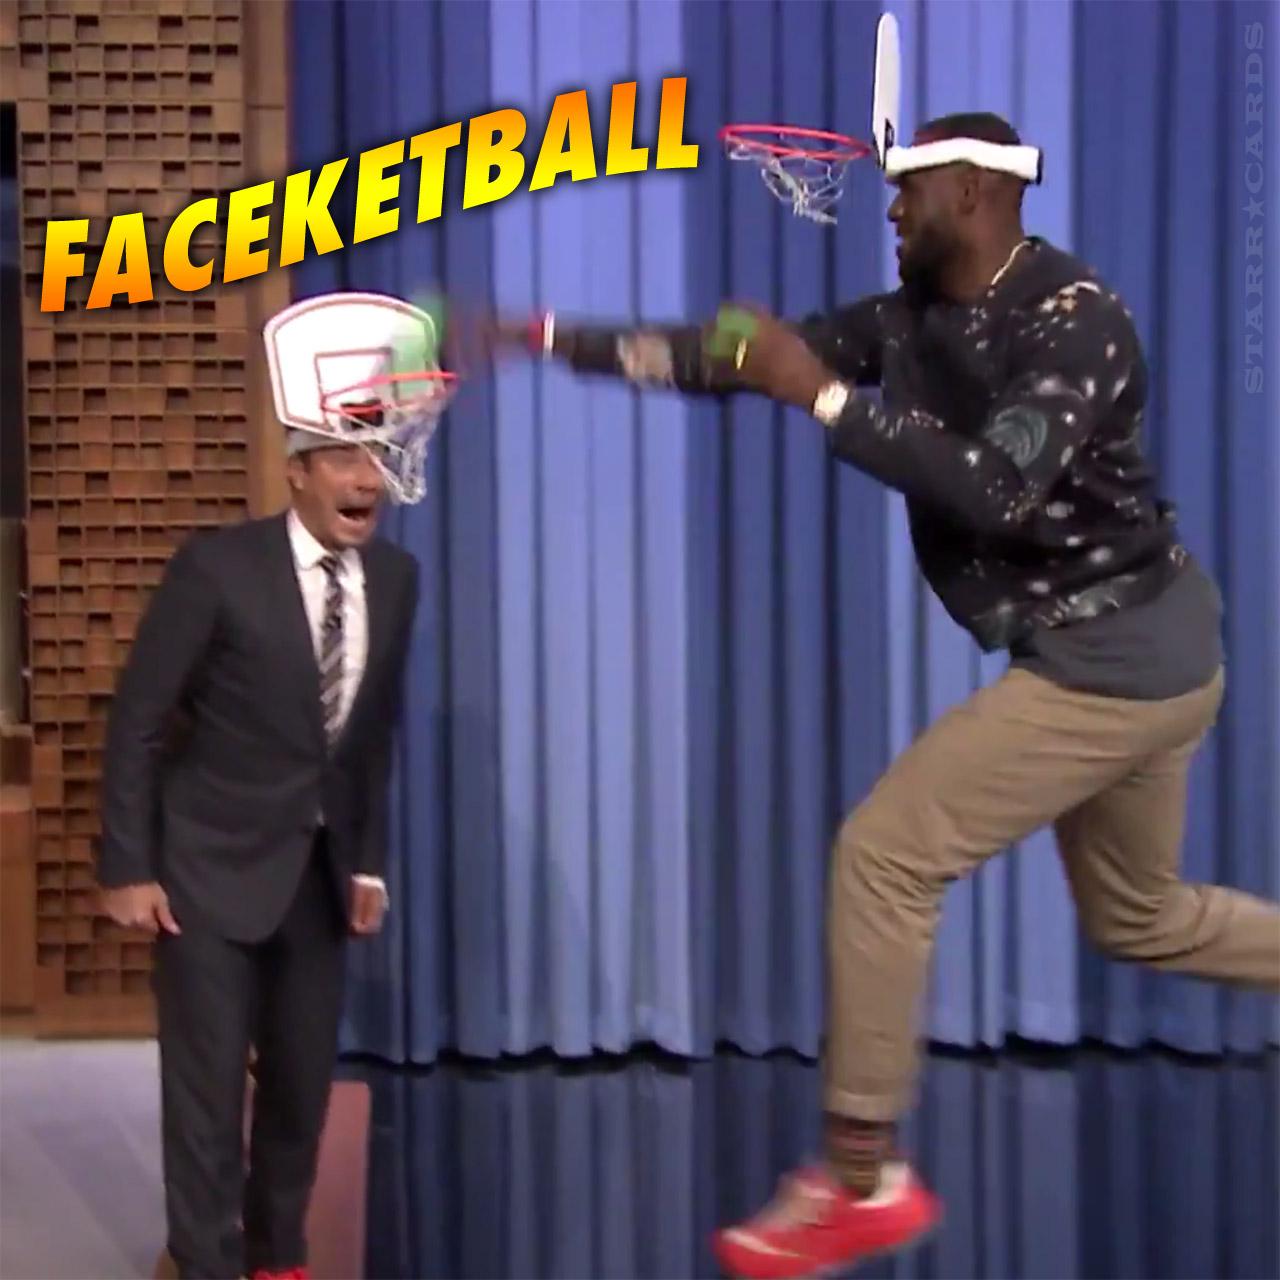 LeBron James double dunks on Jimmy Fallon in faceketball duel